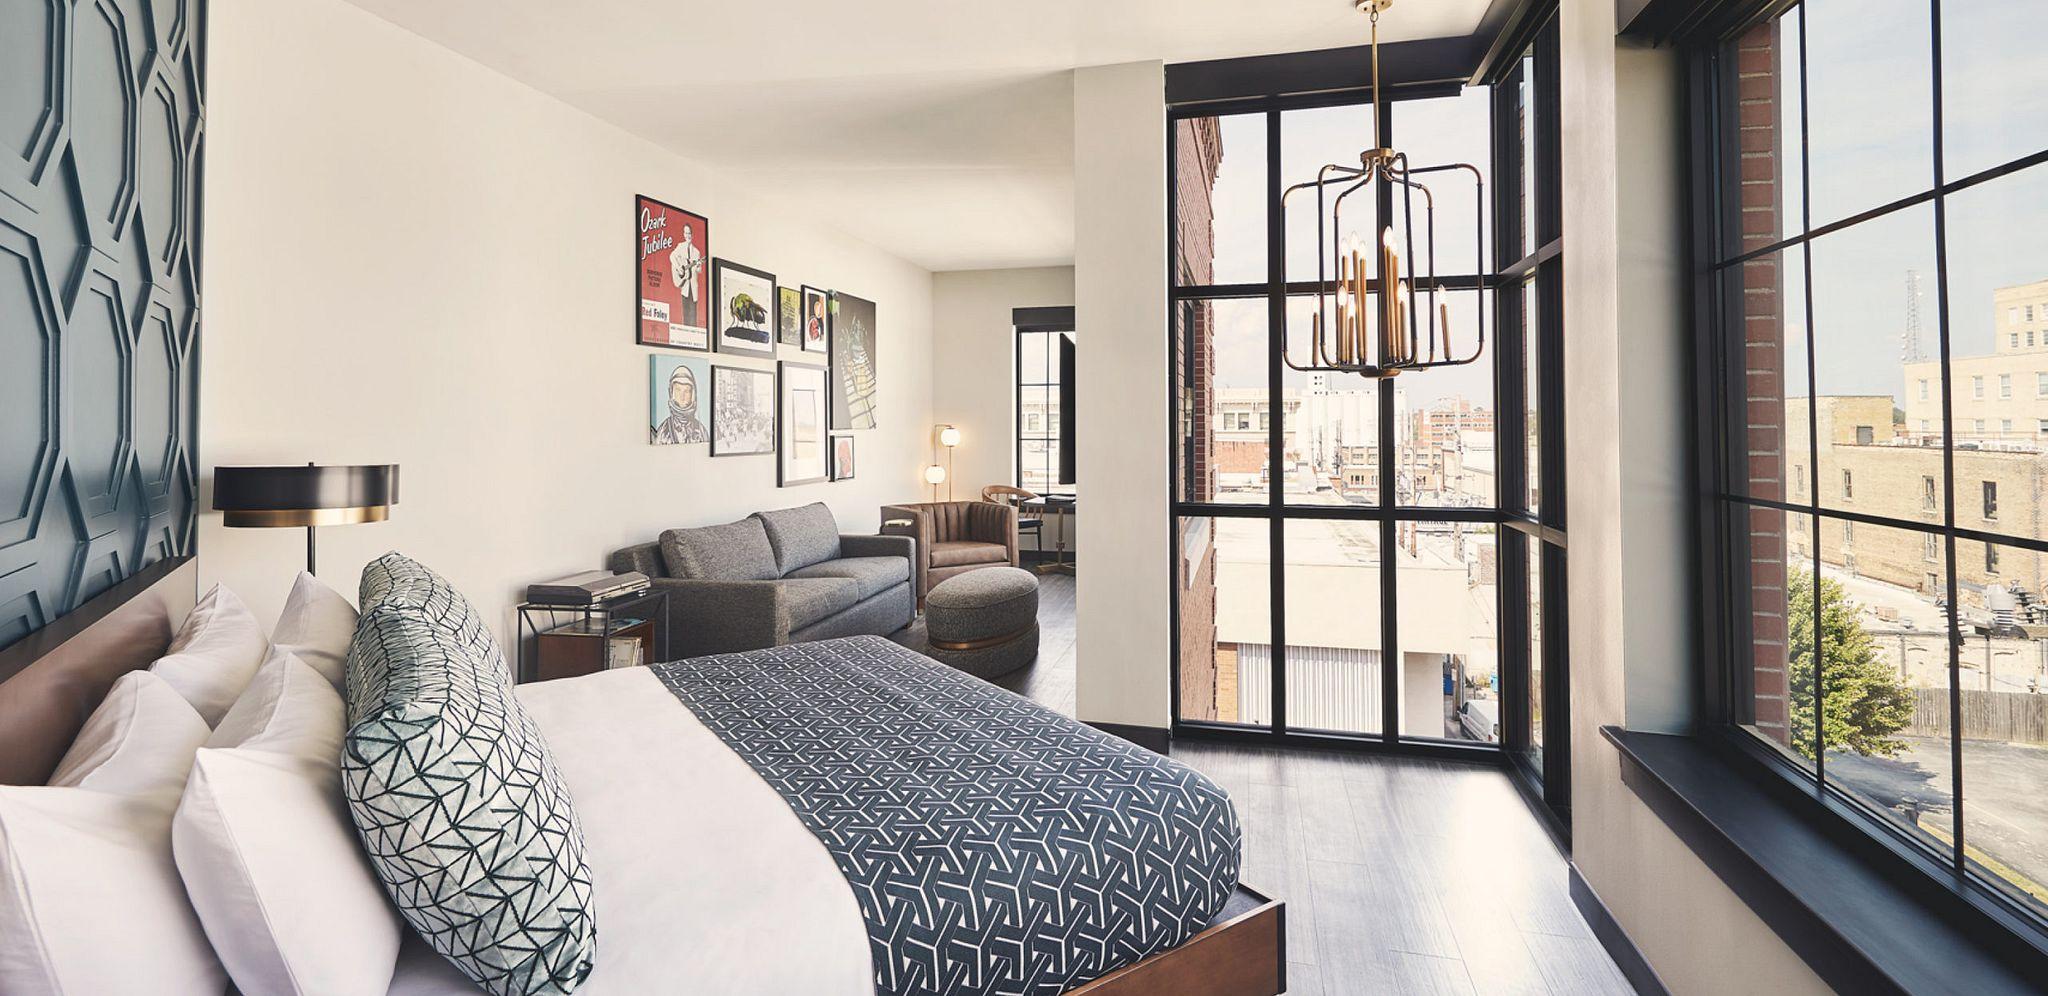 HotelV2 Website4